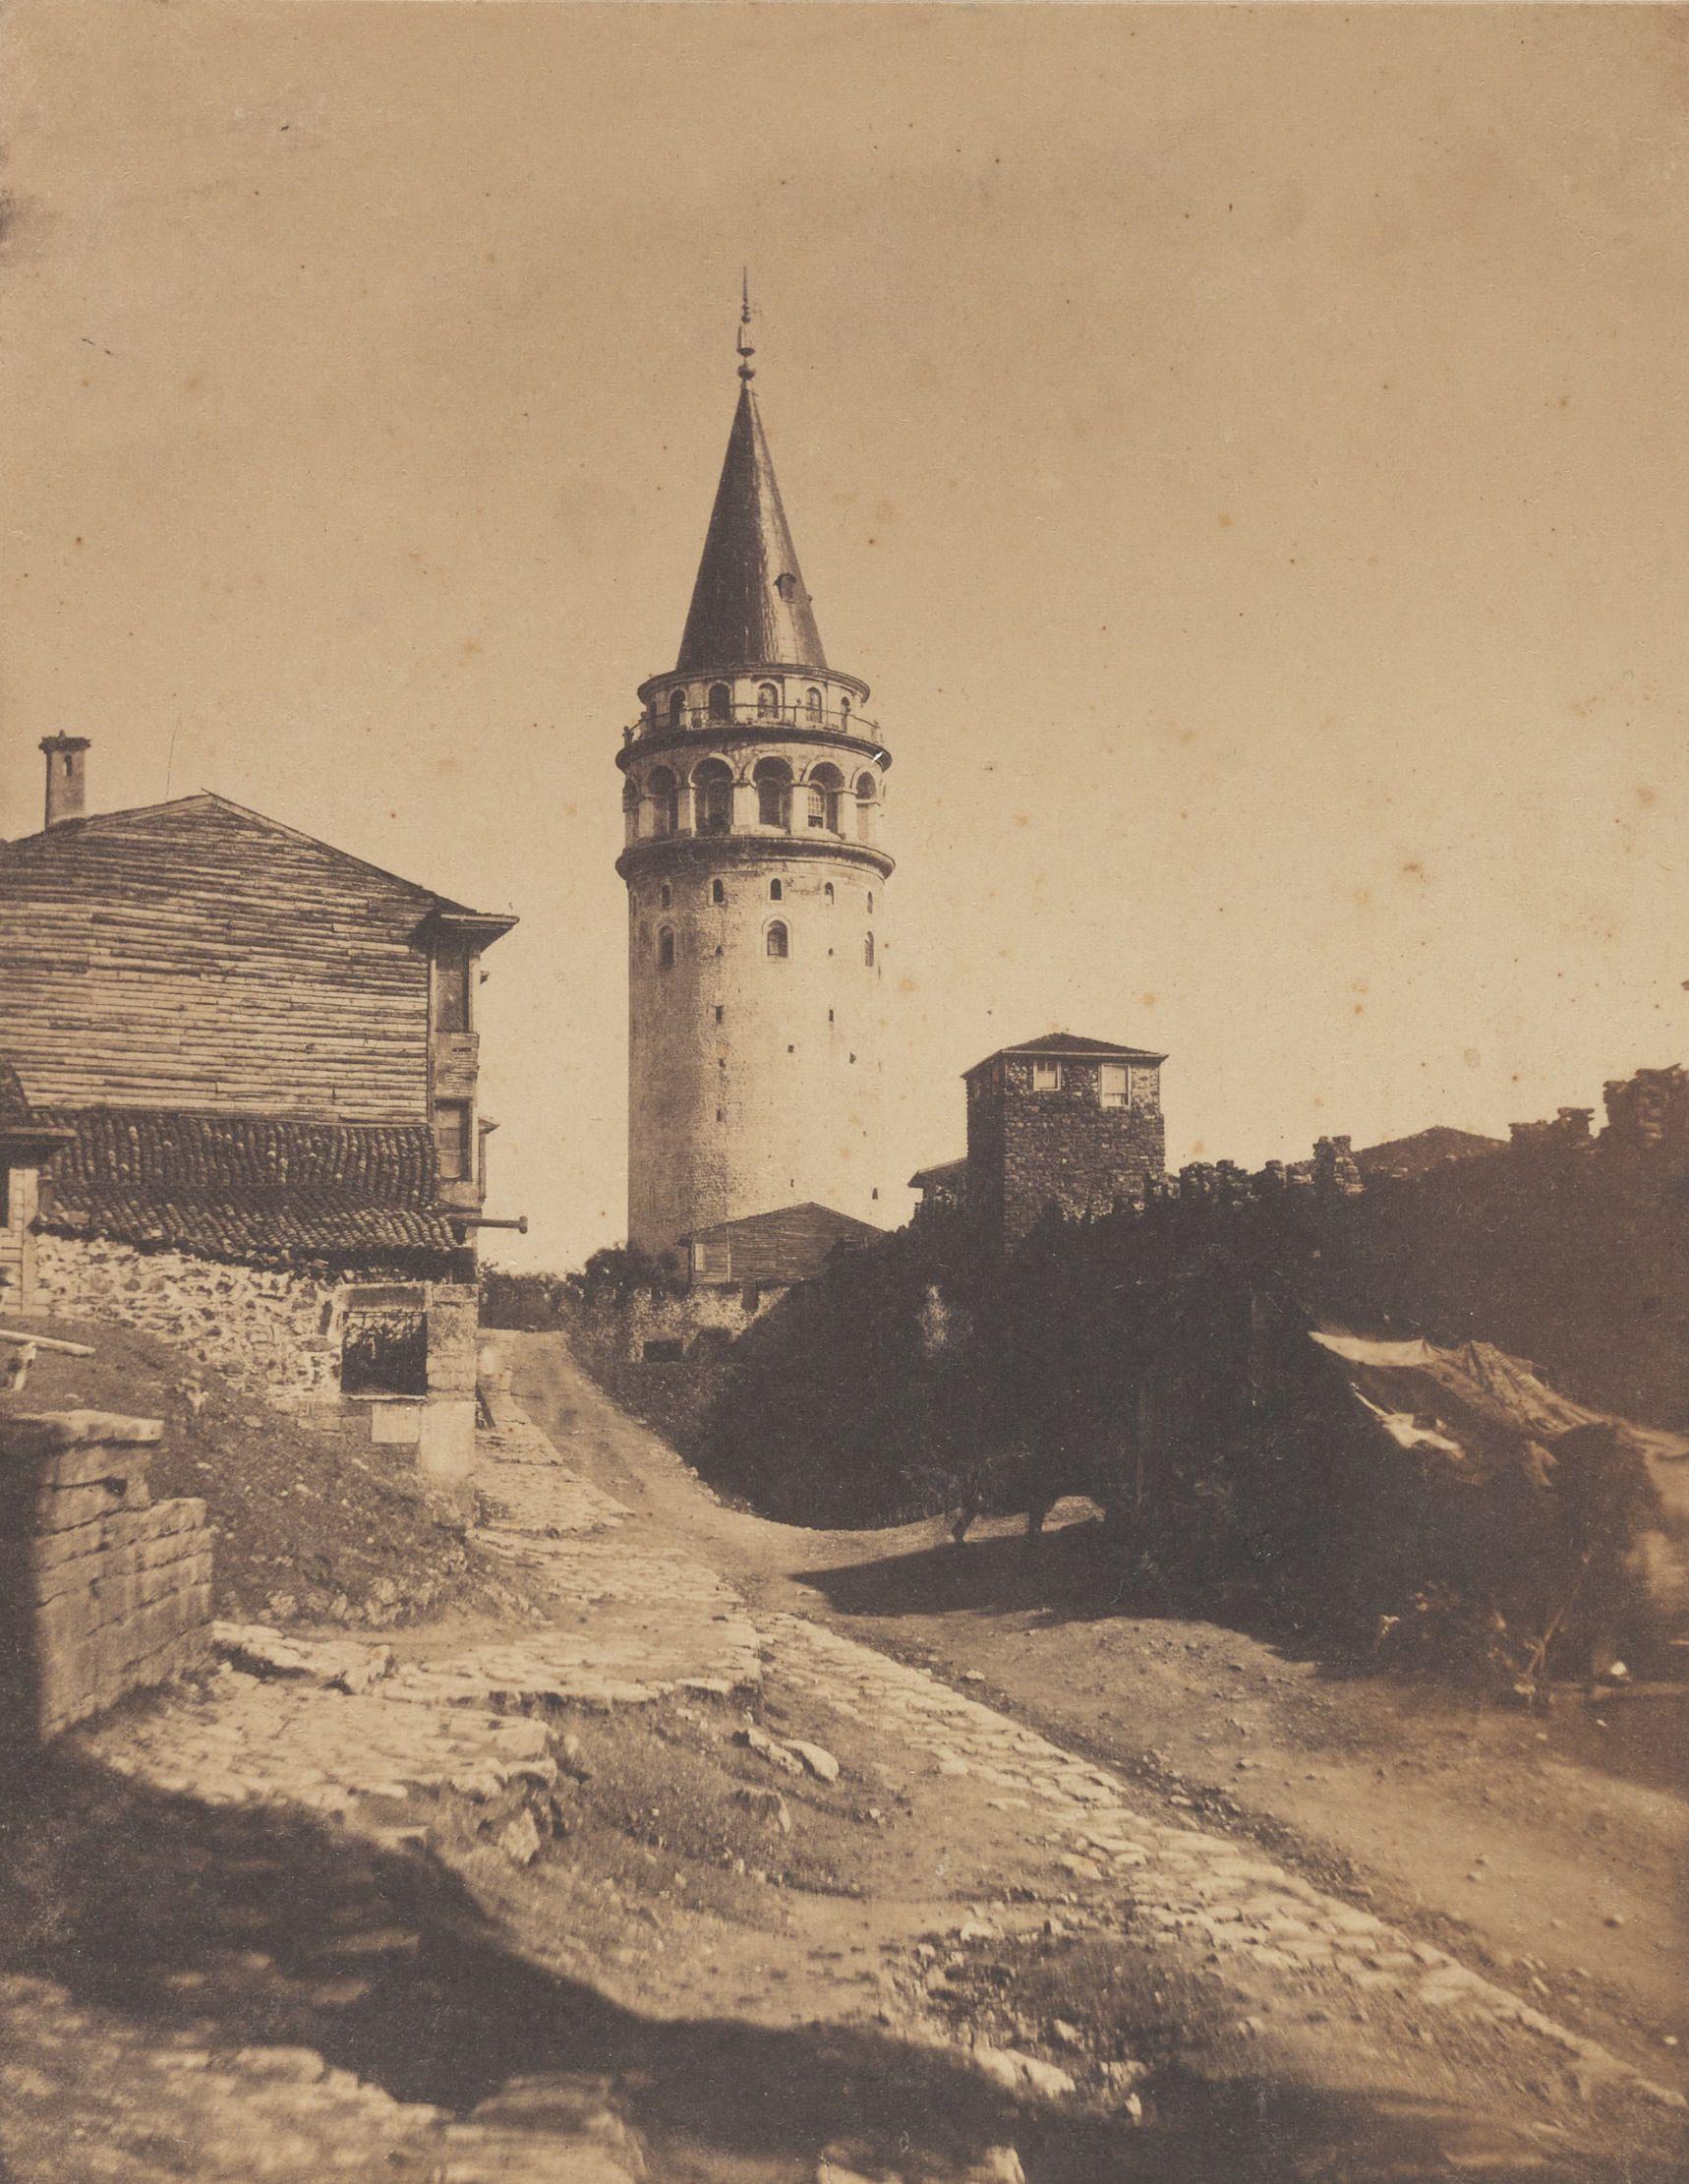 galata kulesi ernest de caranza fotografi 1854 eski istanbul fotograflari arsivi istanbul fotograf mimari fotografcilik